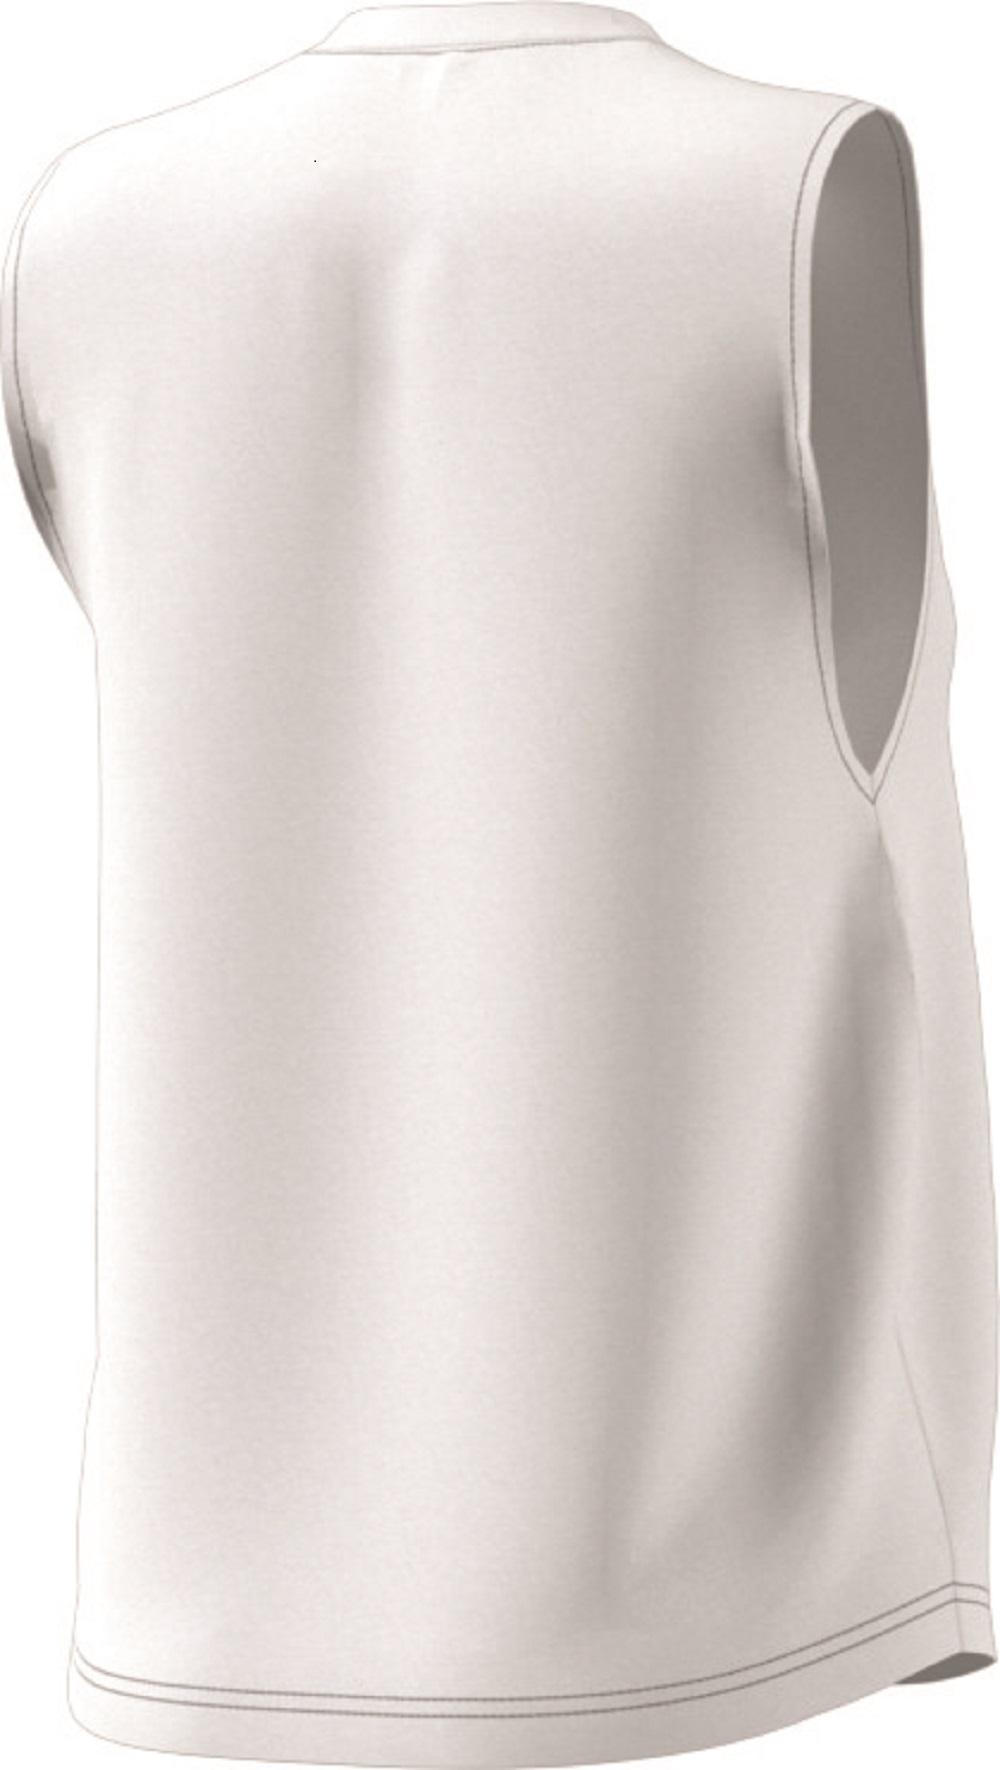 a2cf5f054dabc3 adidas Must Have Tank - Damen Tank Top Shirt - DP2409 weiß Lifestyle ...